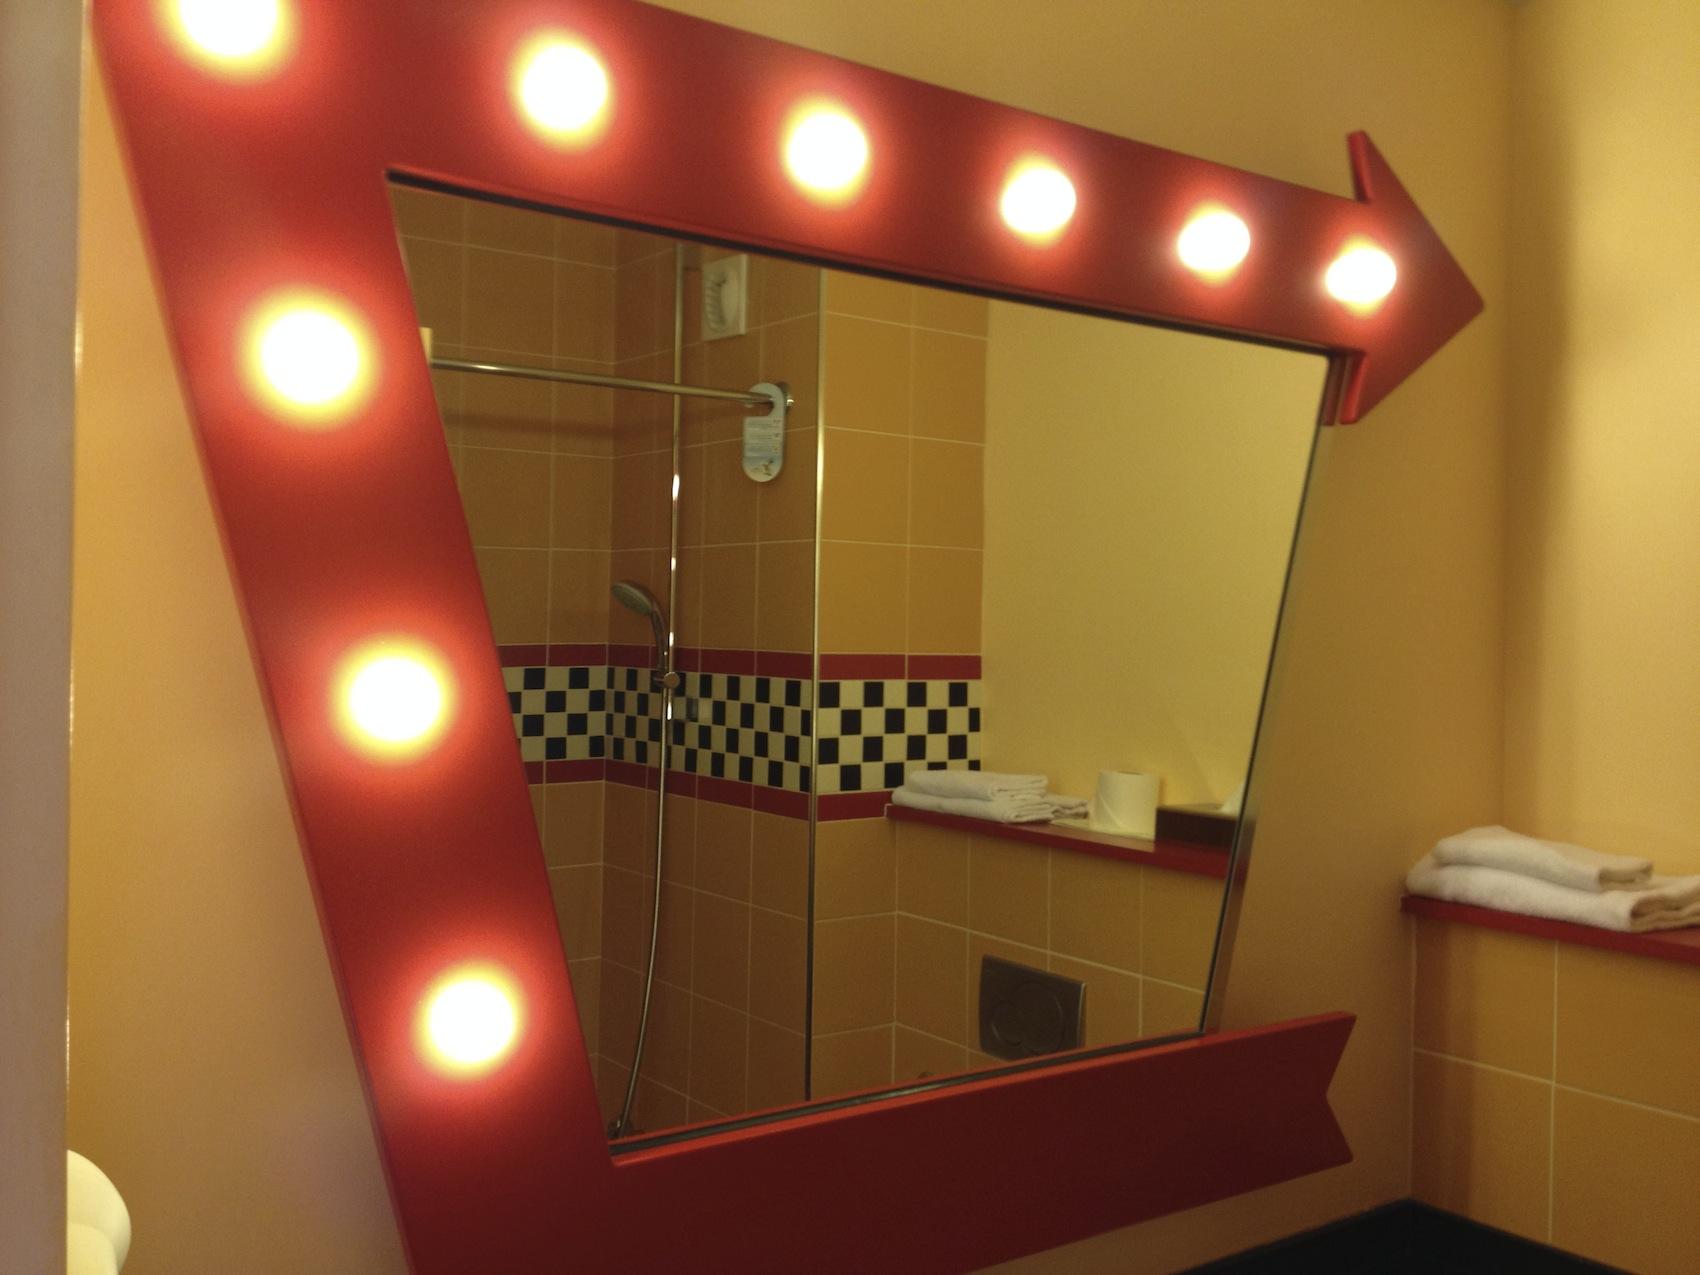 chambre hotel santa fe cars disneyland paris room le. Black Bedroom Furniture Sets. Home Design Ideas